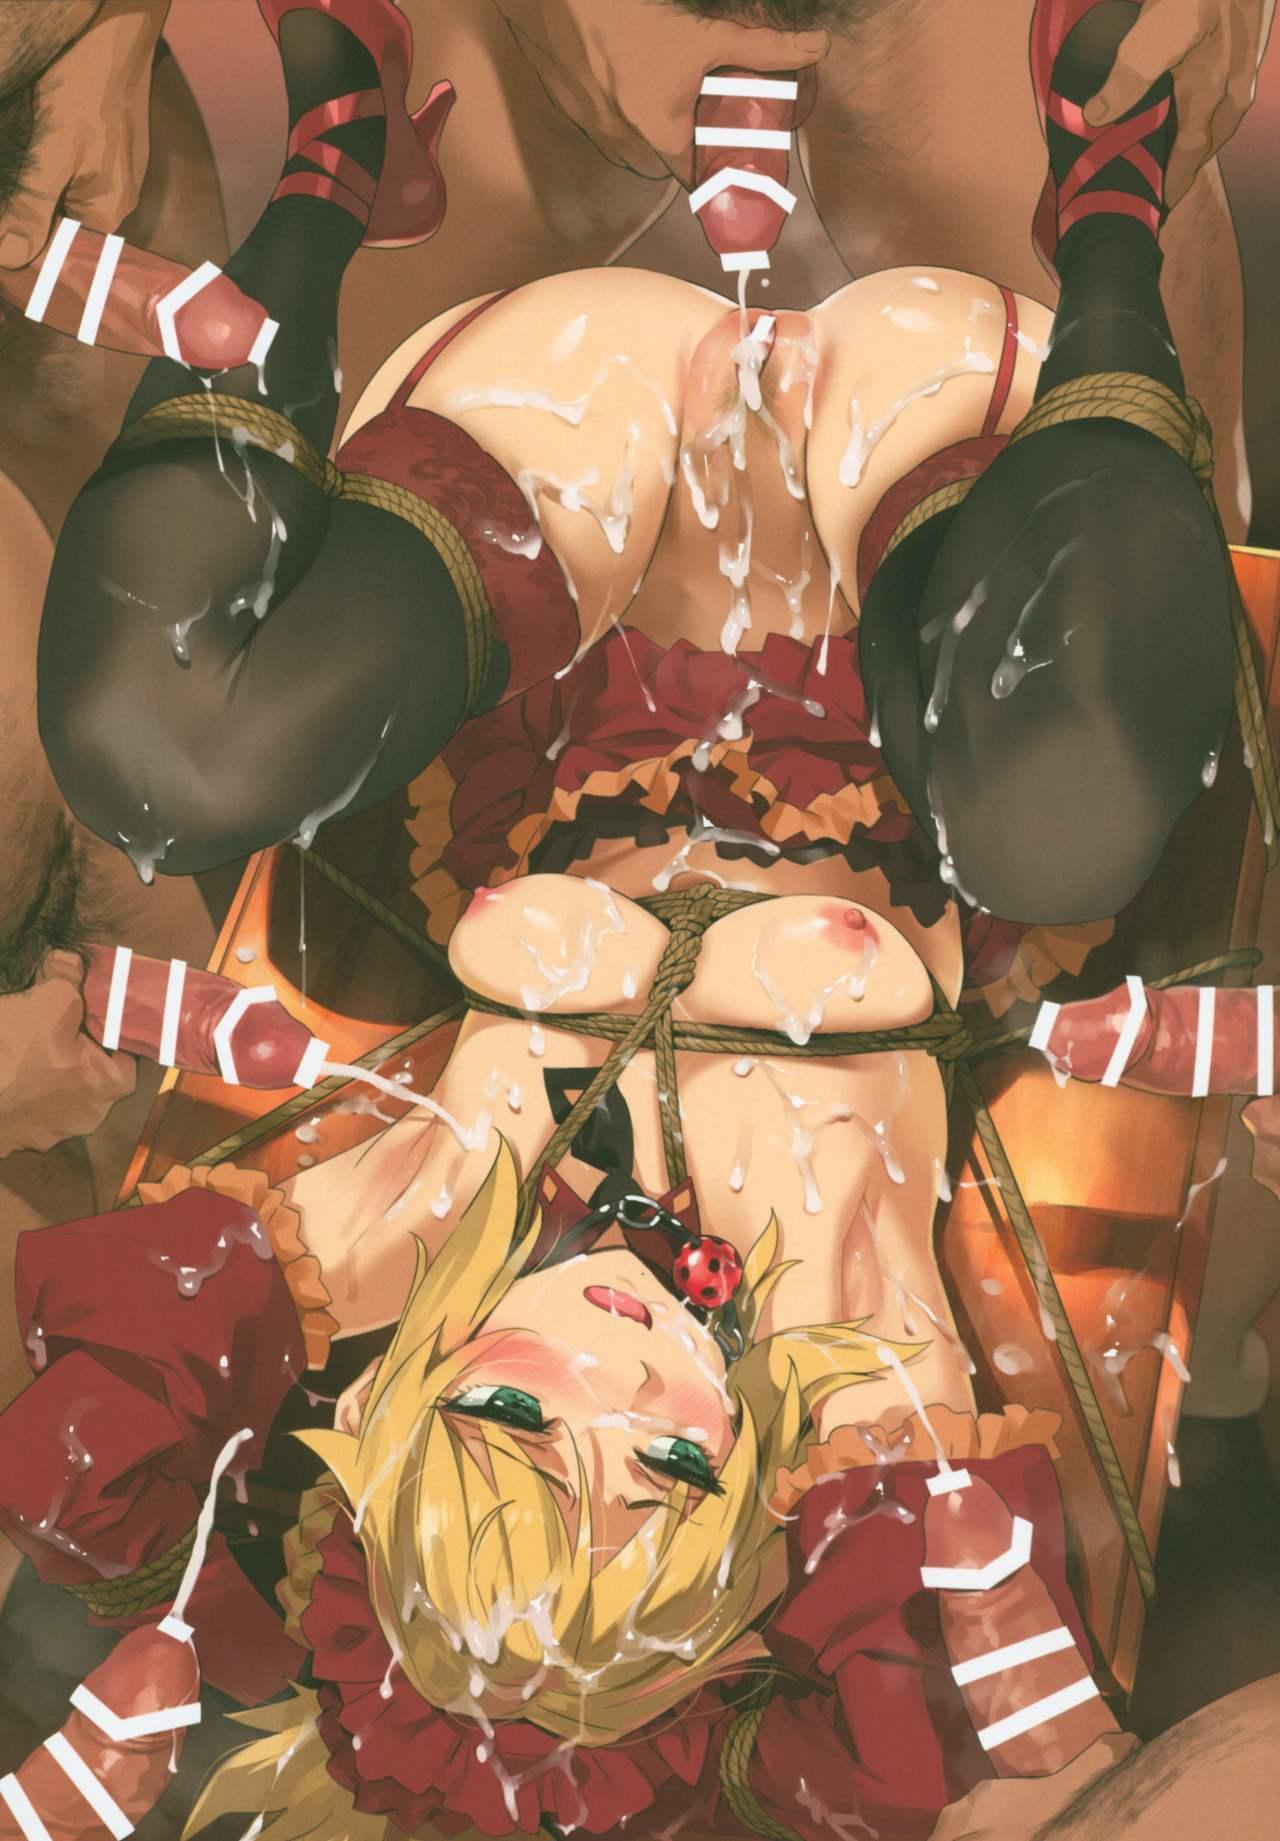 Chaldea Maid 9